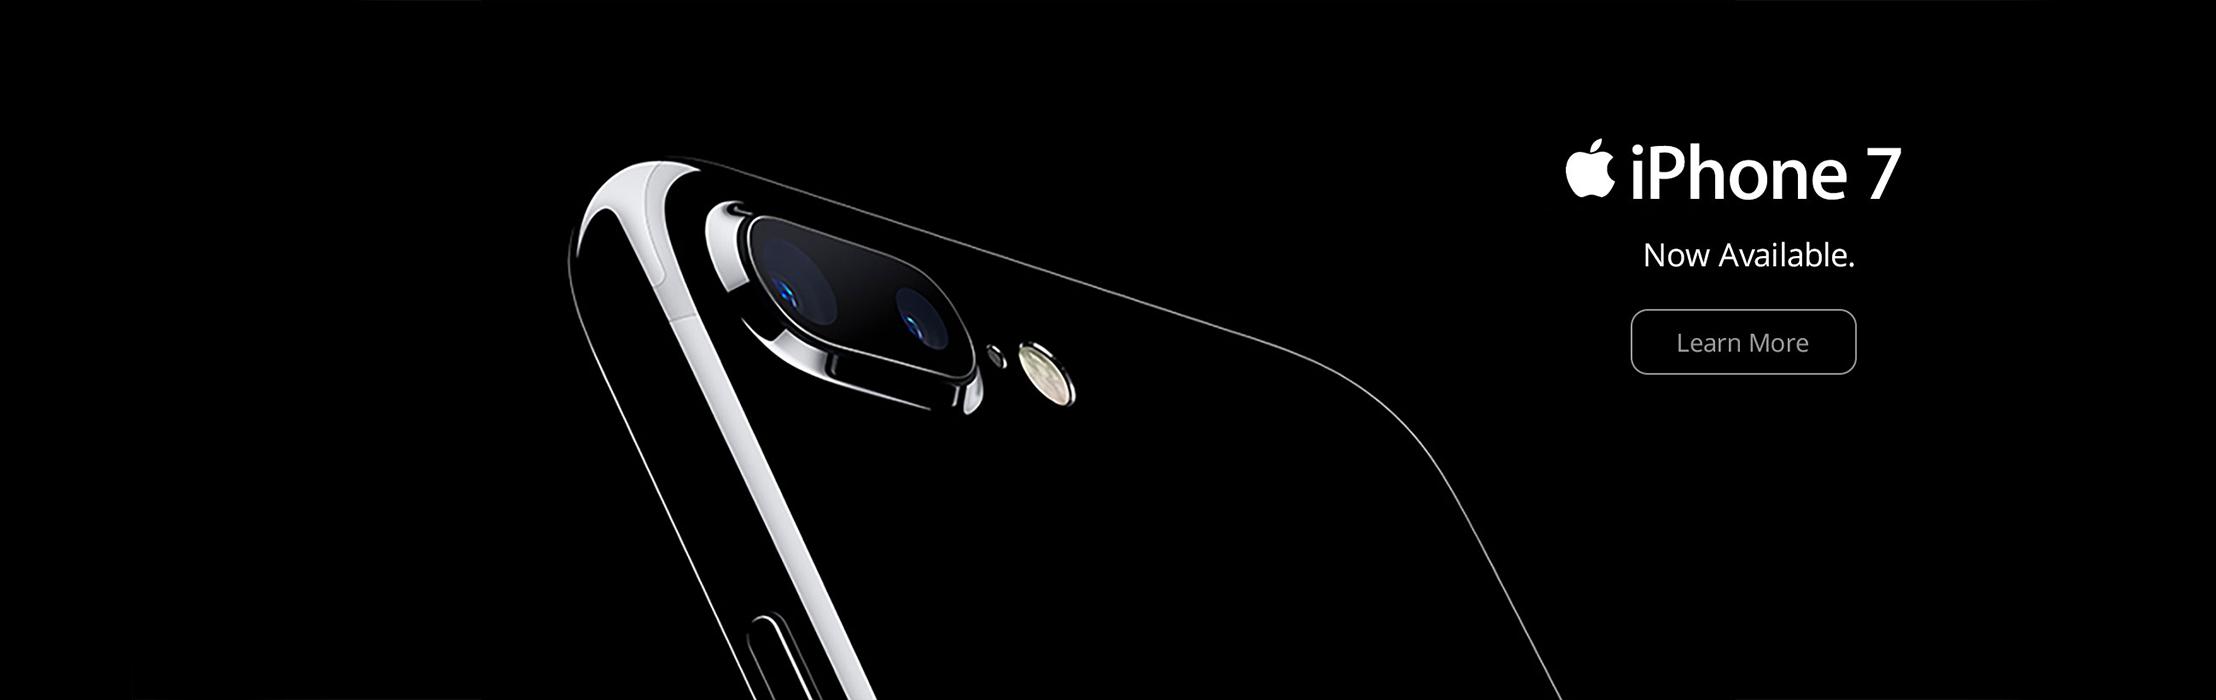 TELUS Apple iPhone 7